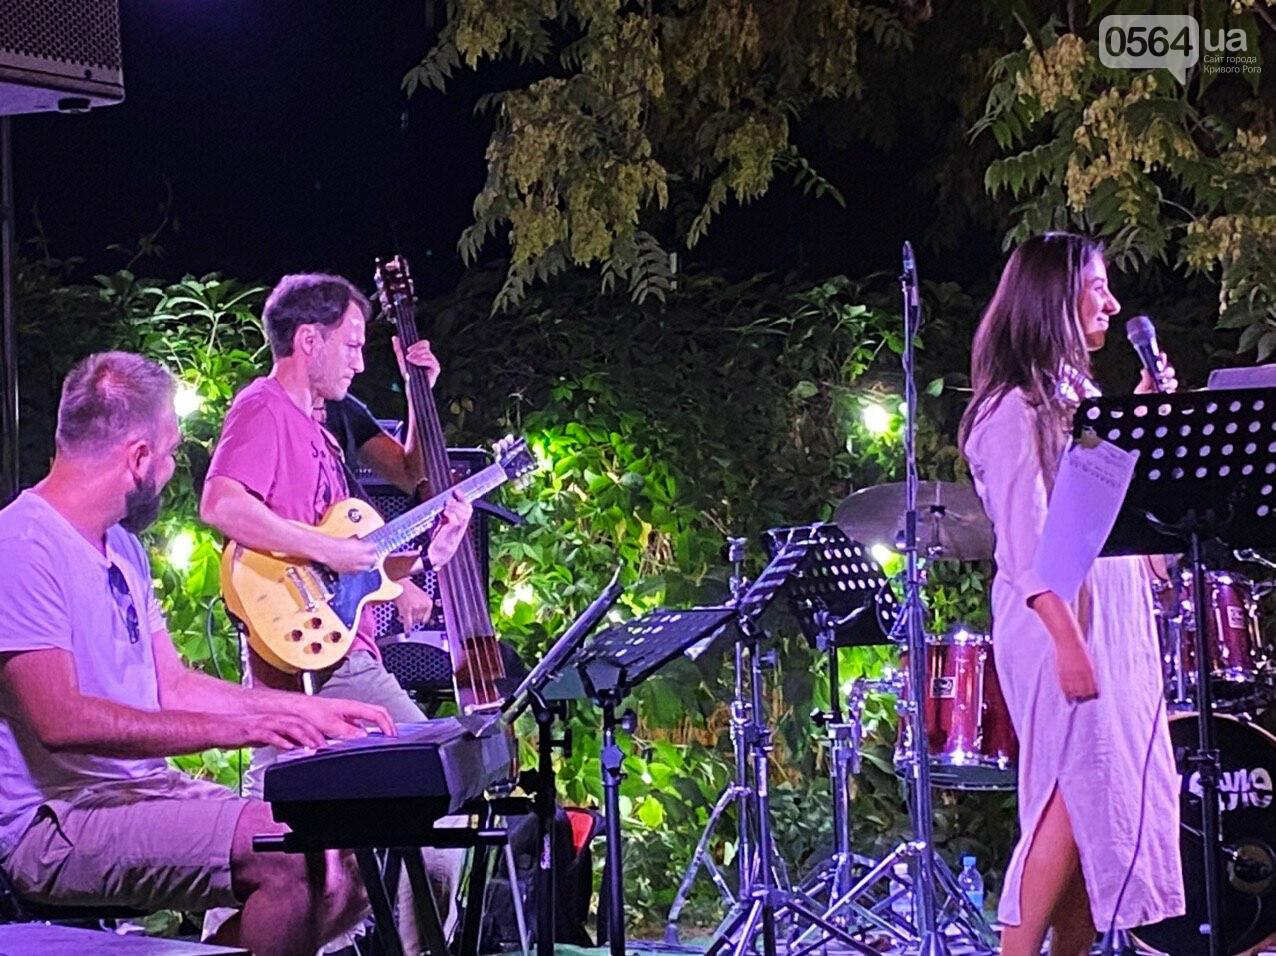 Под звездным небом криворожане наслаждались летним джазом от  Advantage Project, - ФОТО, ВИДЕО , фото-72